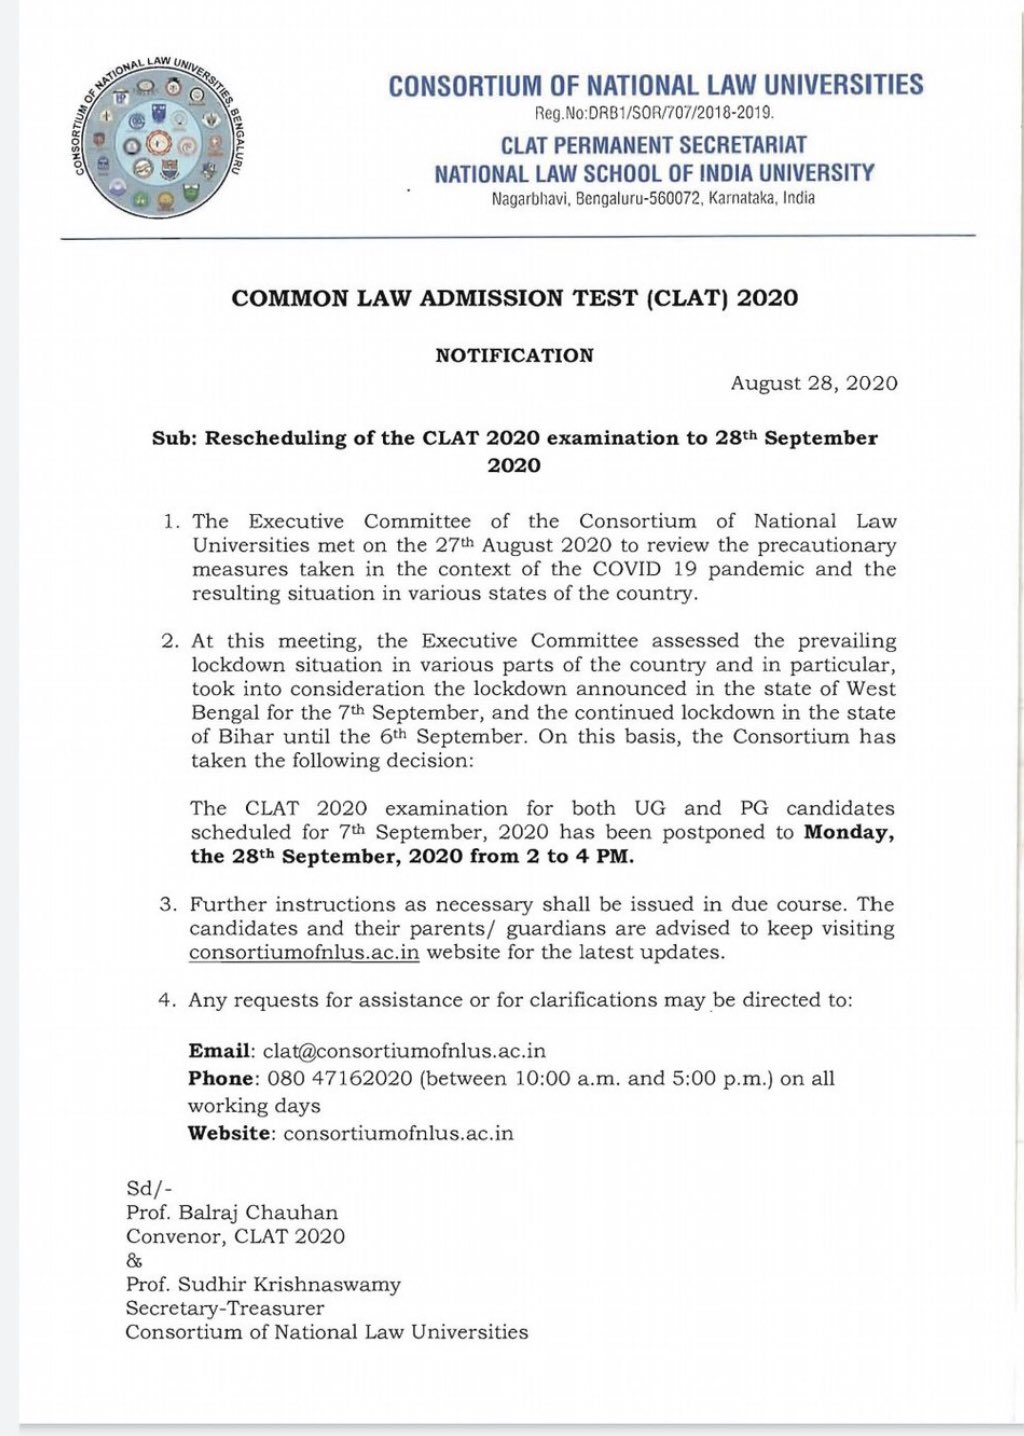 CLAT Exam 2020 has been officially postponed today | UPPSC.UP.NIC.IN | UPPSC GOVERNMENT JOBS VACANCY RECRUITMENT NO. 2/2021-22